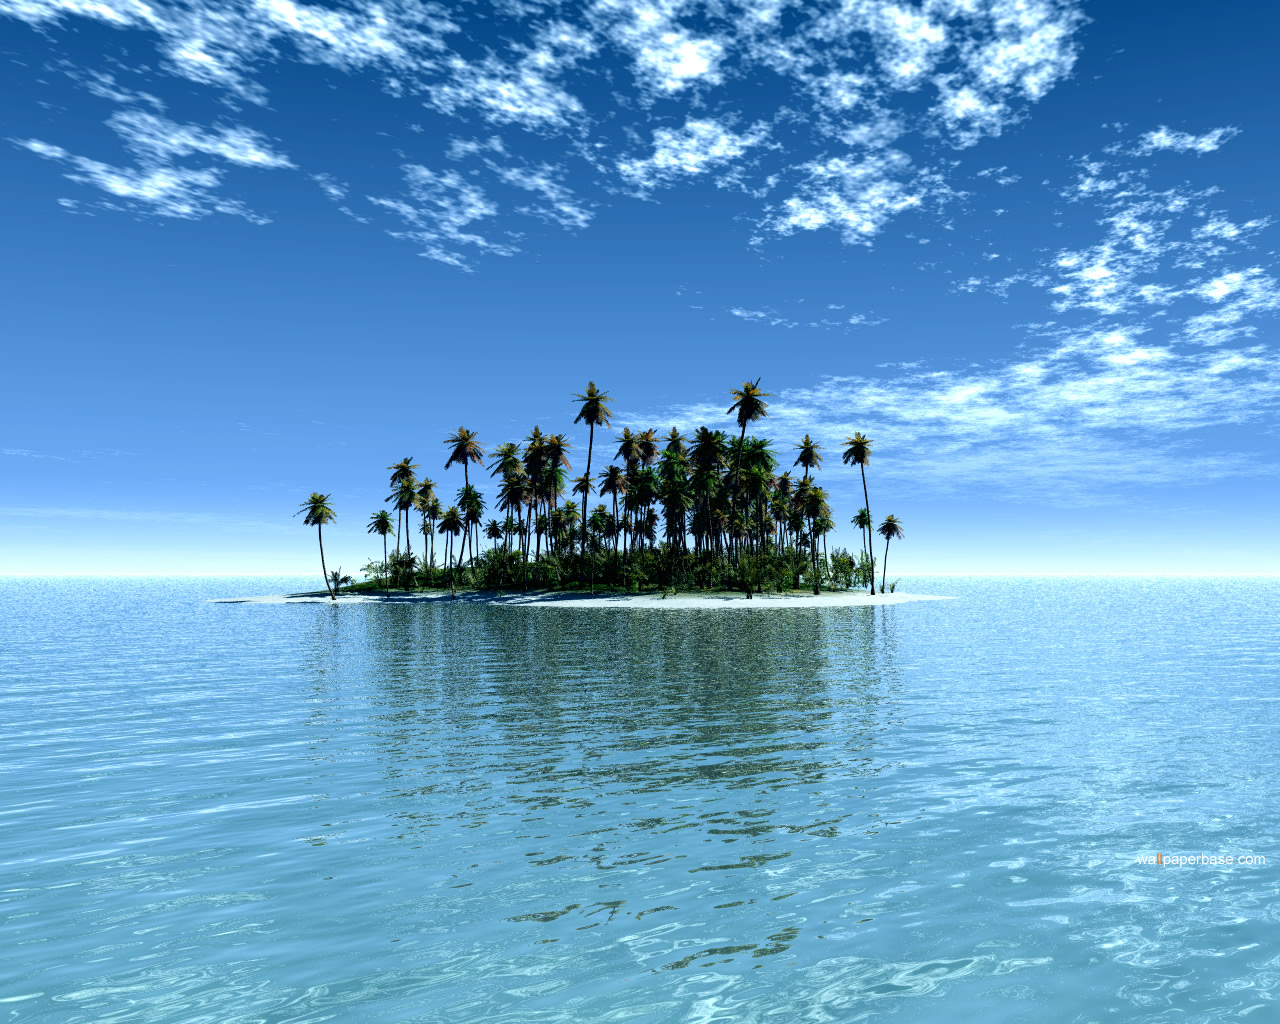 Fondos De Pantalla Con Movimiento 3d Hd: World Visits: Paradise Island Wallpaper Review